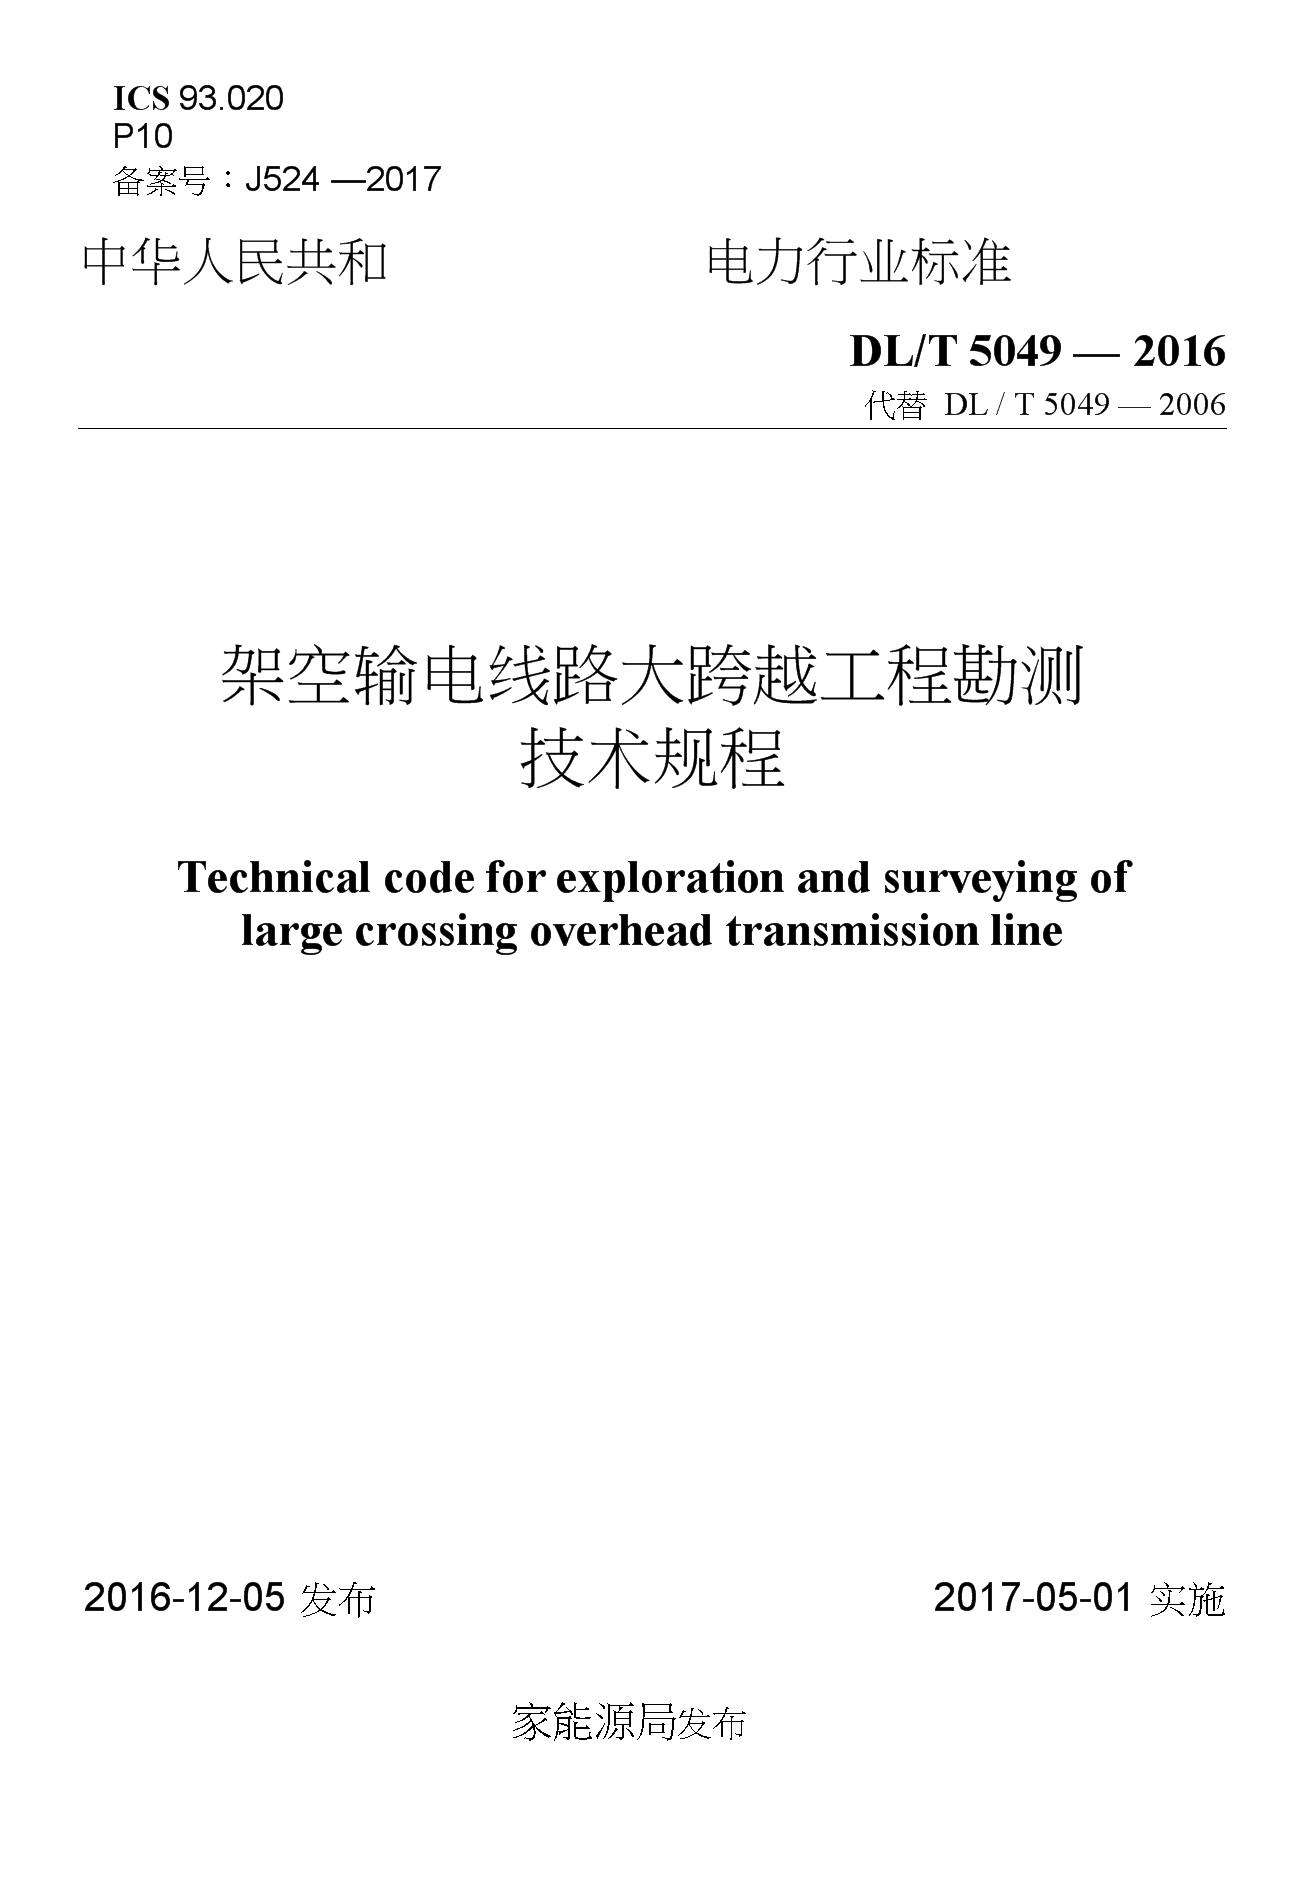 DL∕T 5049-2016 架空输电线路大跨越工程勘测技术规程.docx